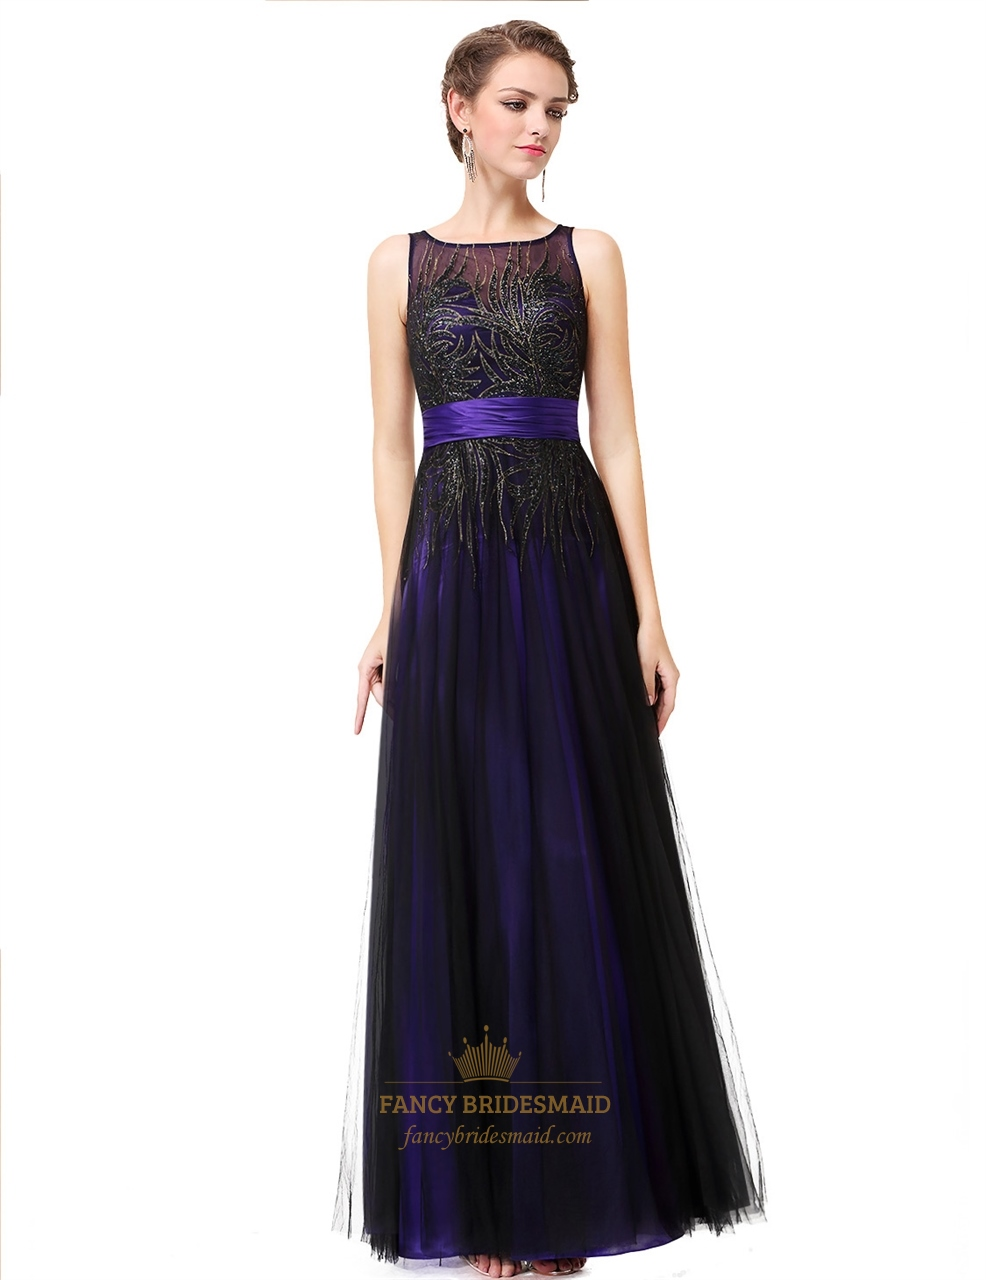 Teal Round Neck Sequin Embellished Tulle Long Prom Dress